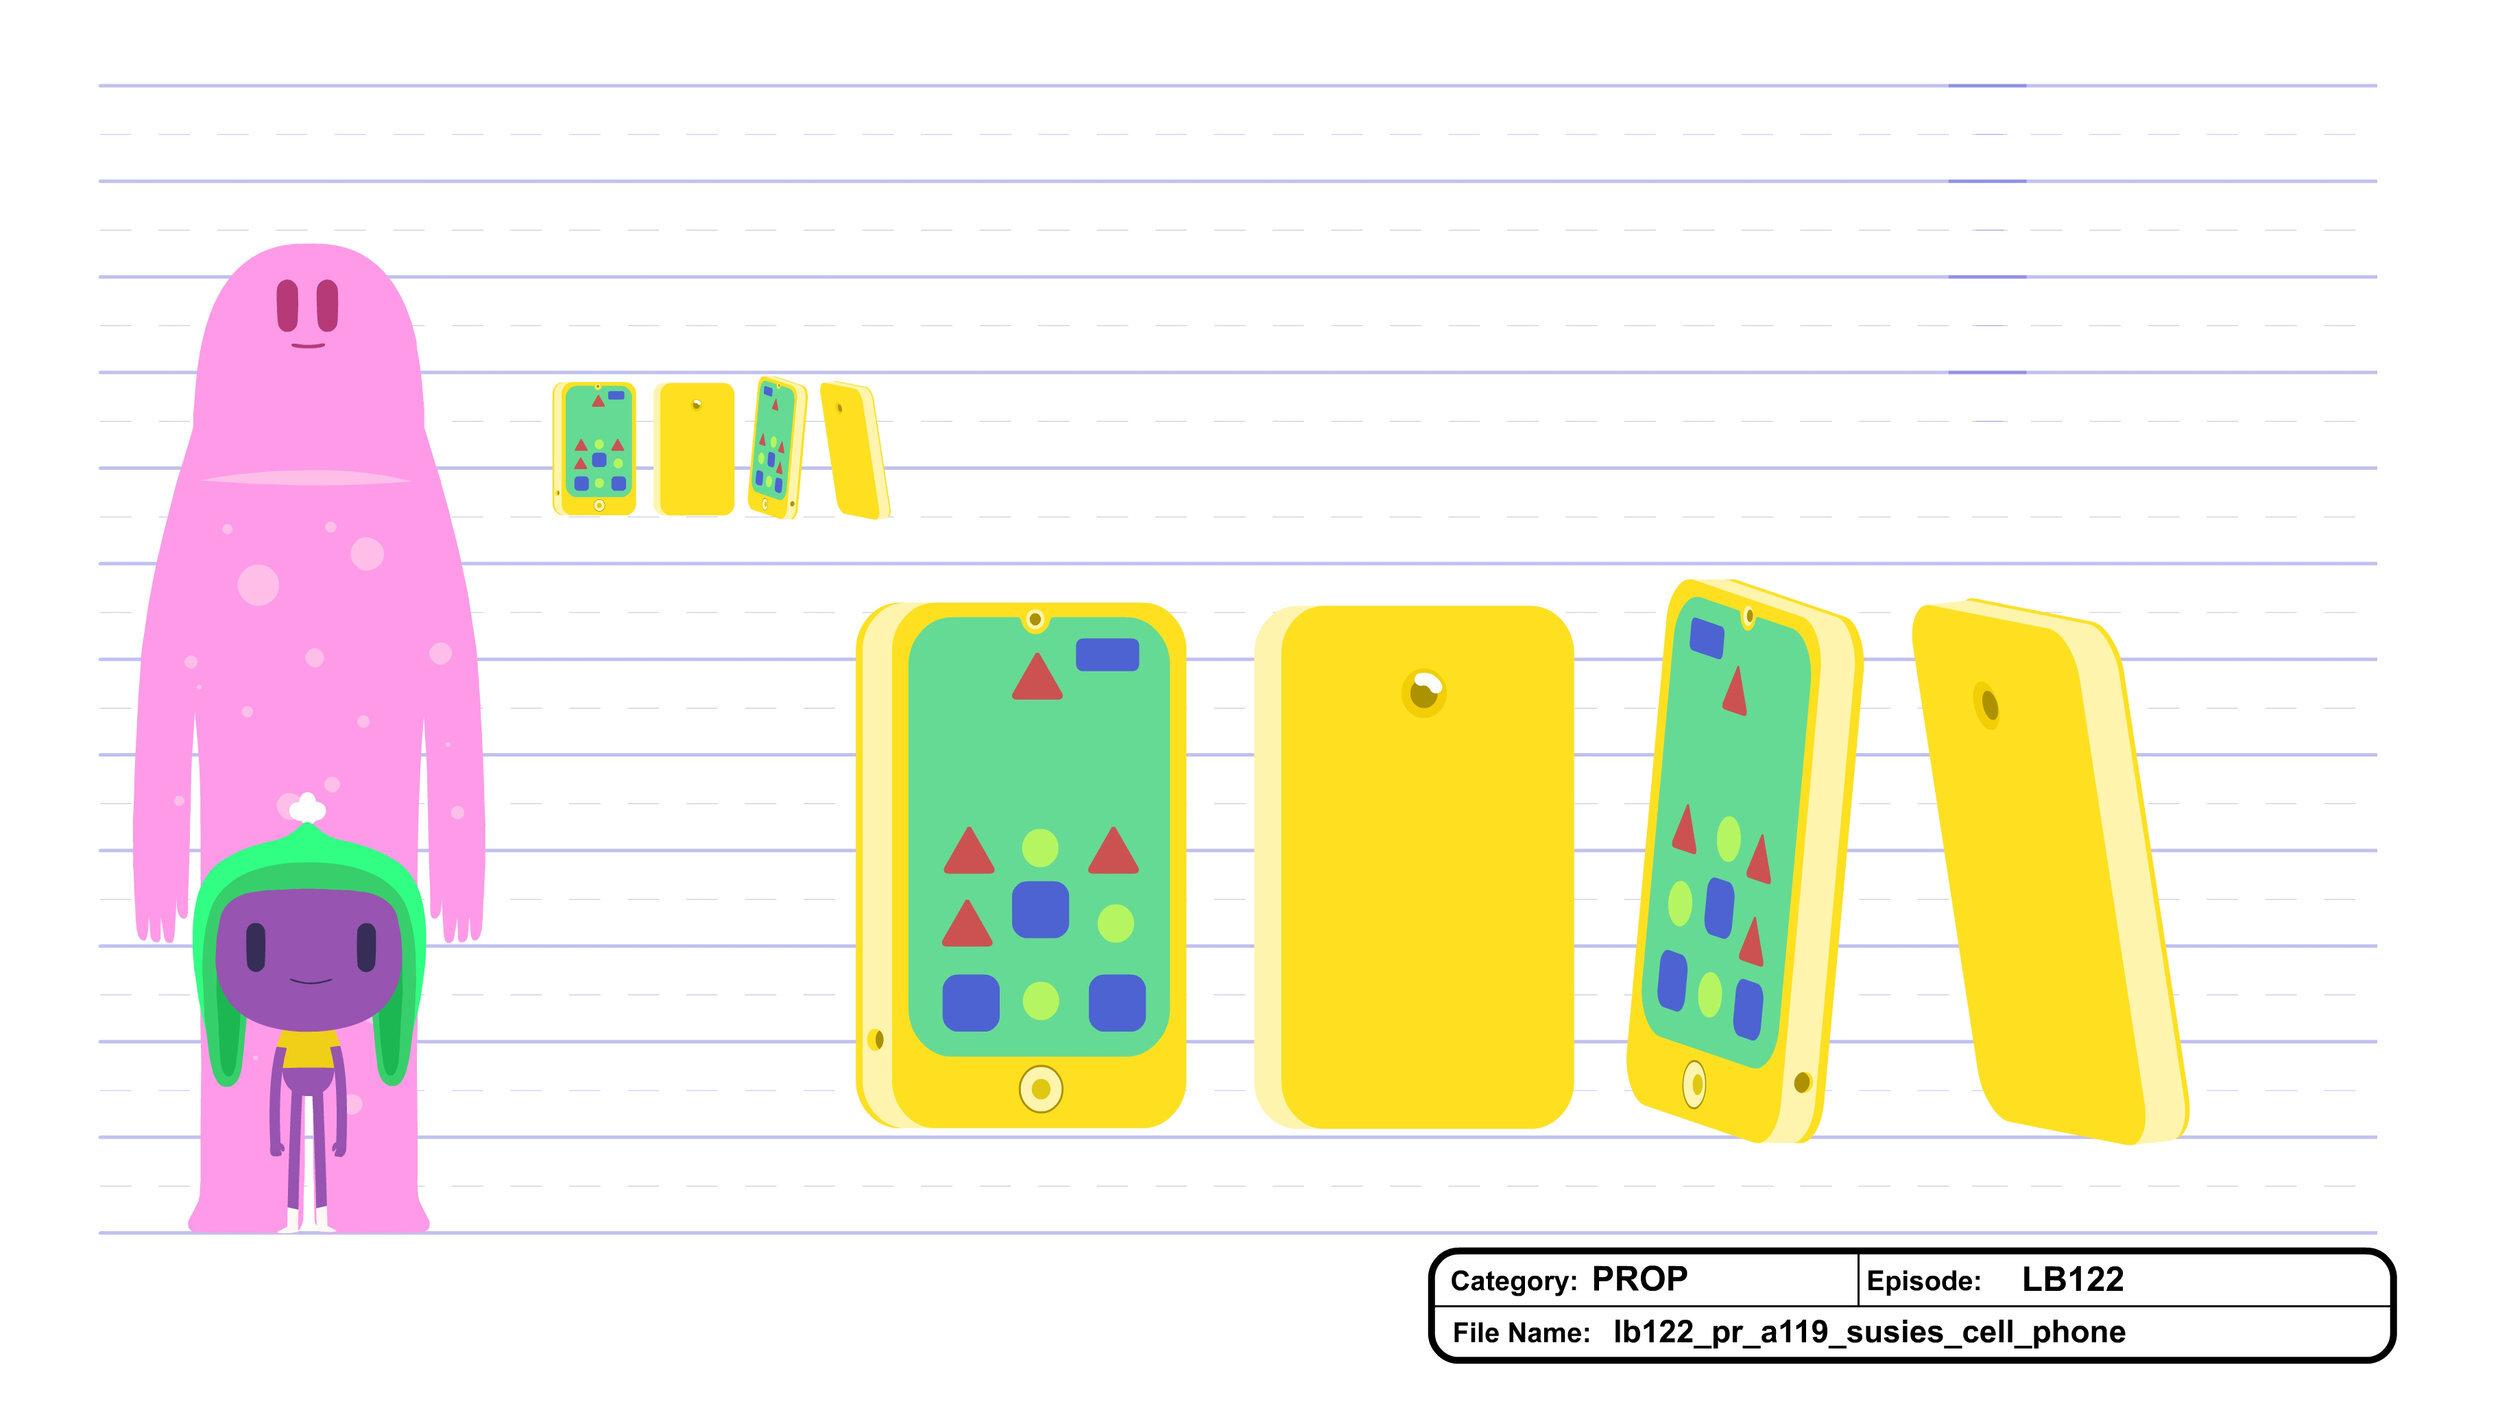 lb122_pr_a119_susies_cell_phone_COLOR_v04_MK.jpg